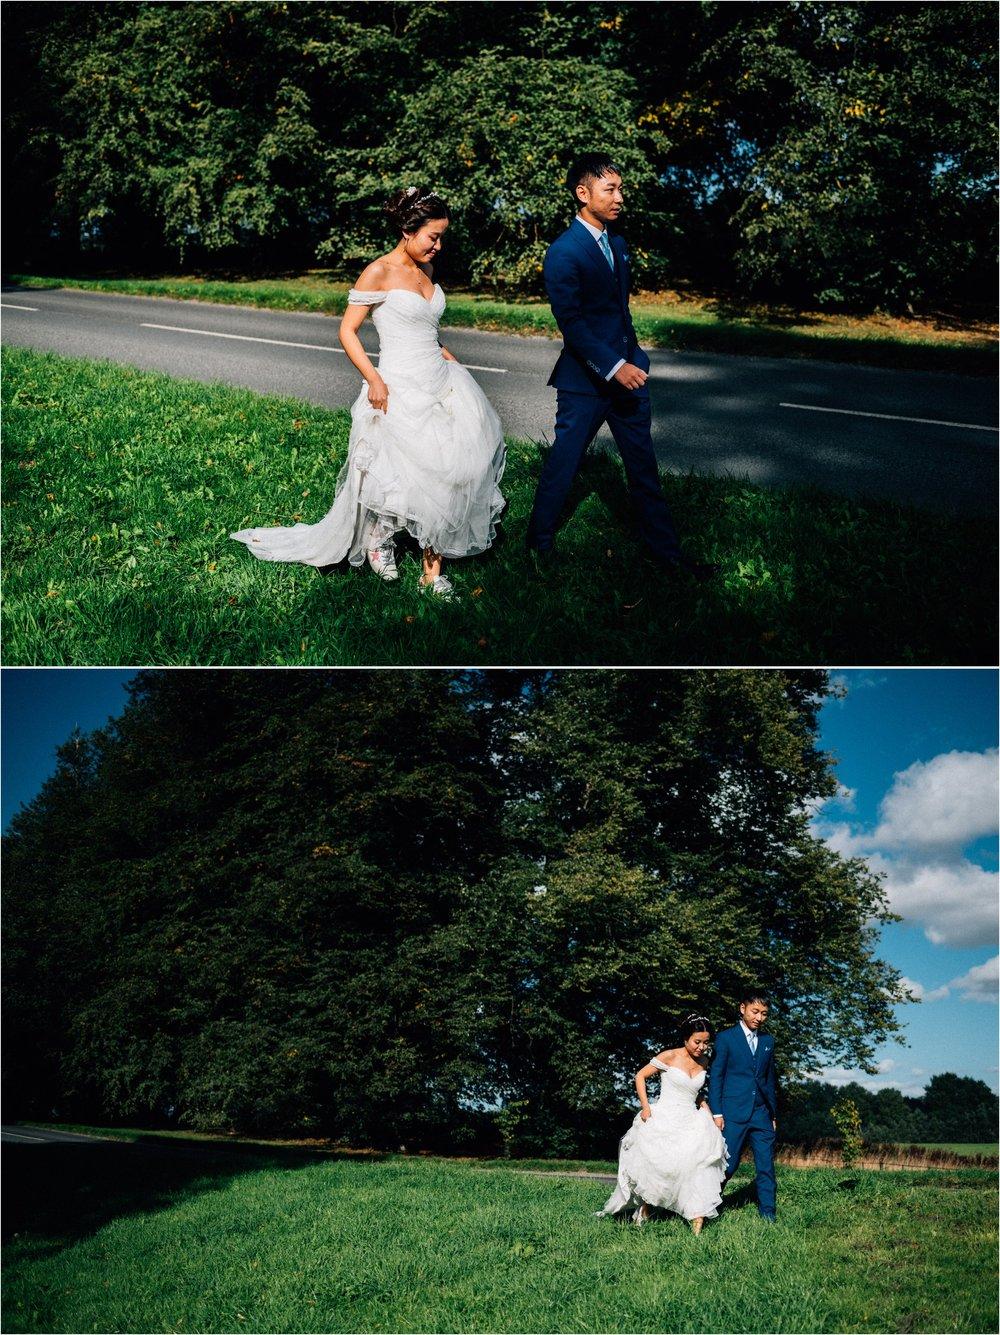 York city elopement wedding photographer_0185.jpg